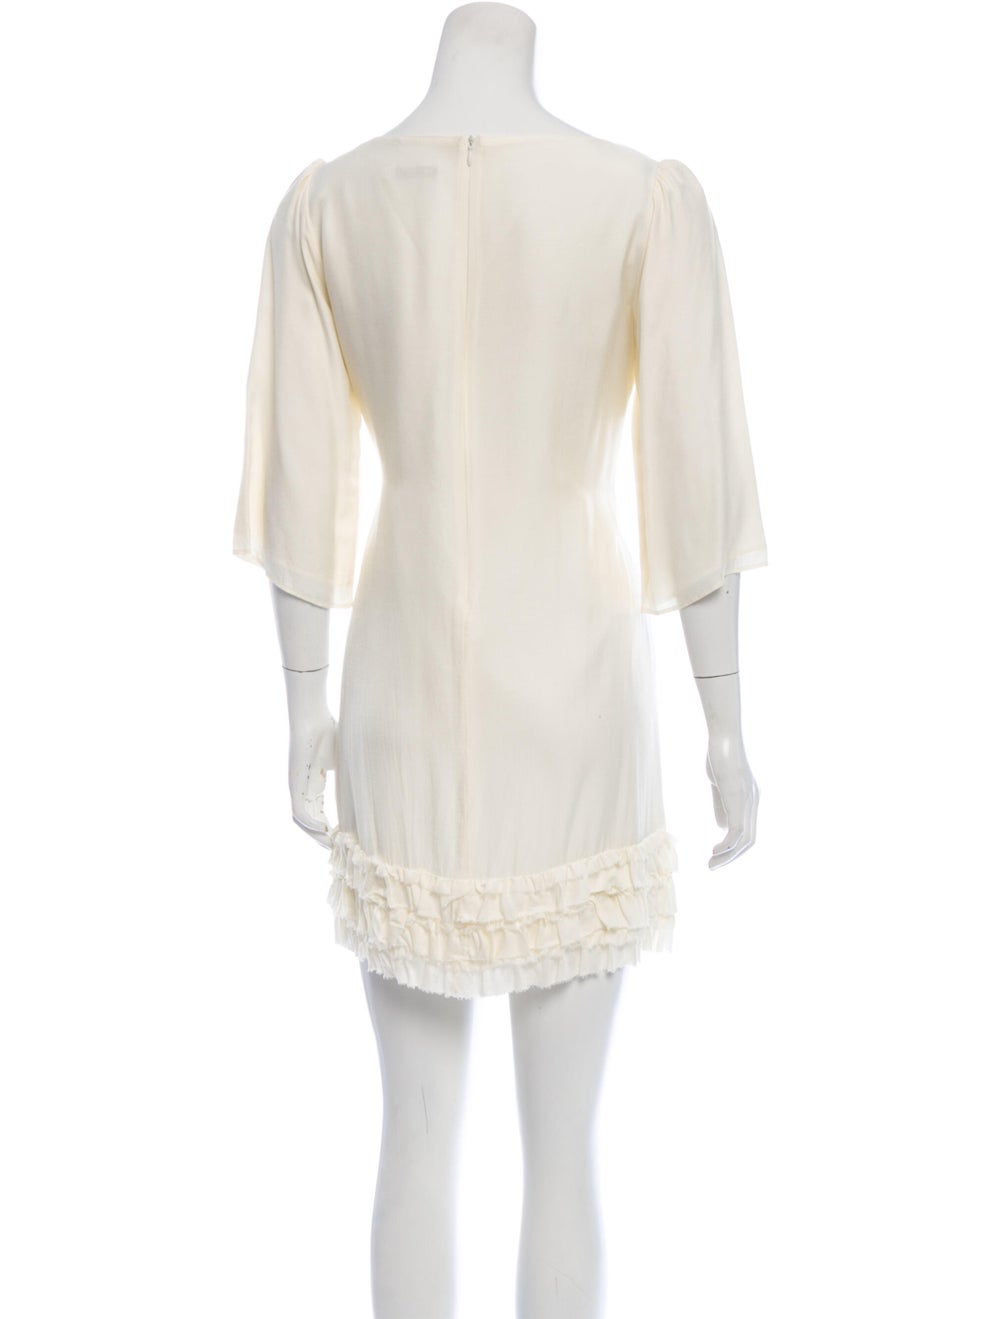 Marimekko Bateau Neckline Mini Dress - image 3